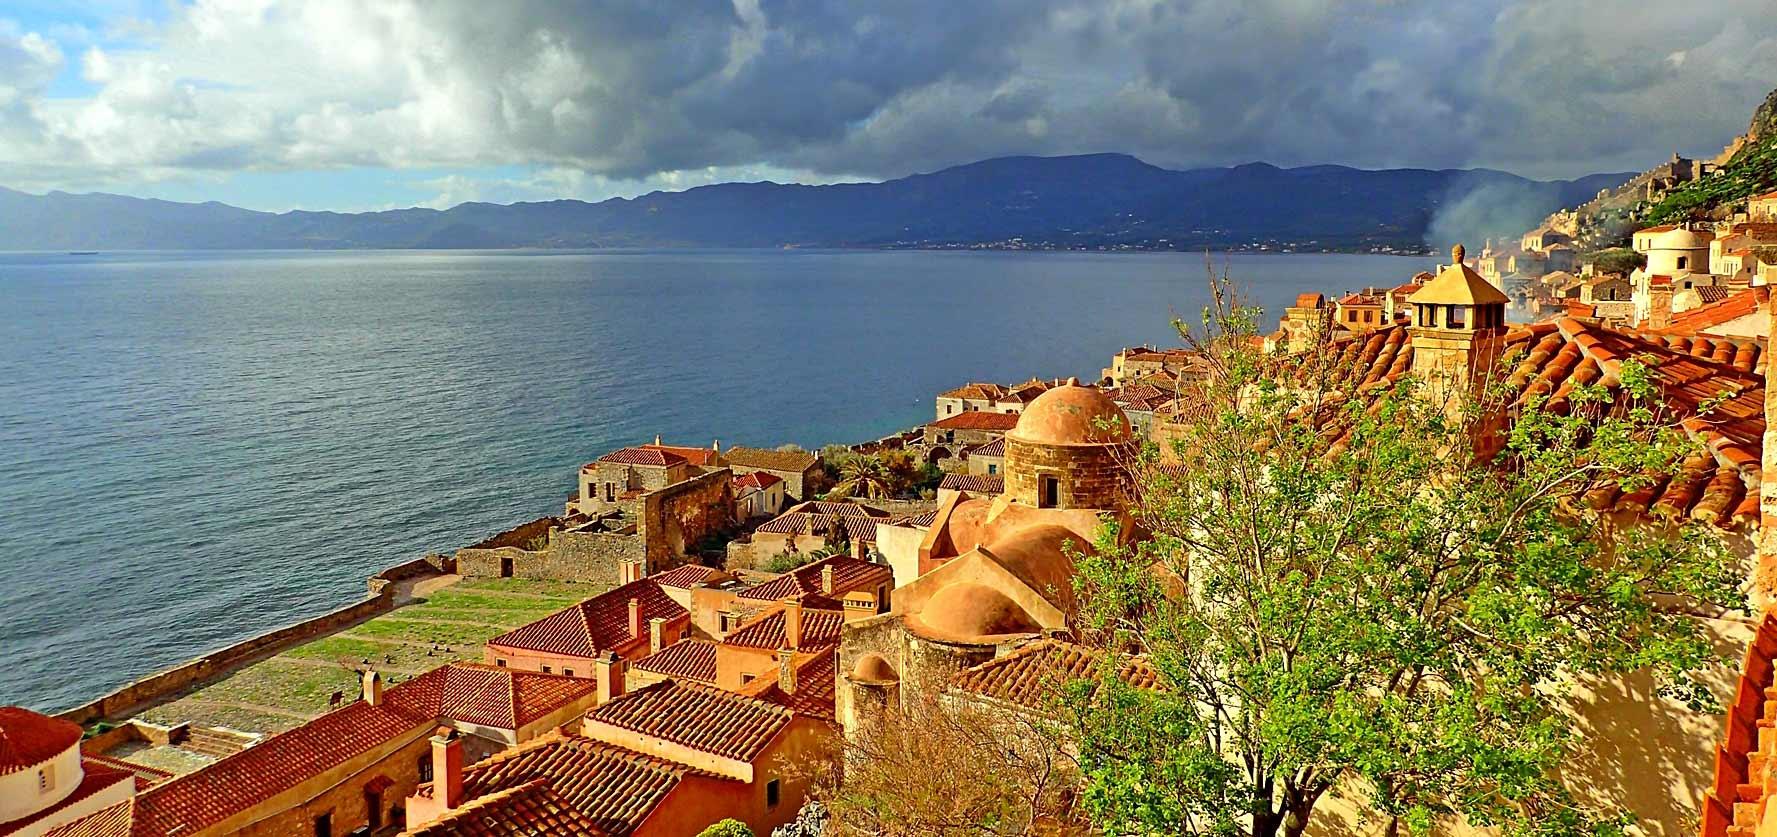 monemvasia city greece Lakoniabay 1777x837